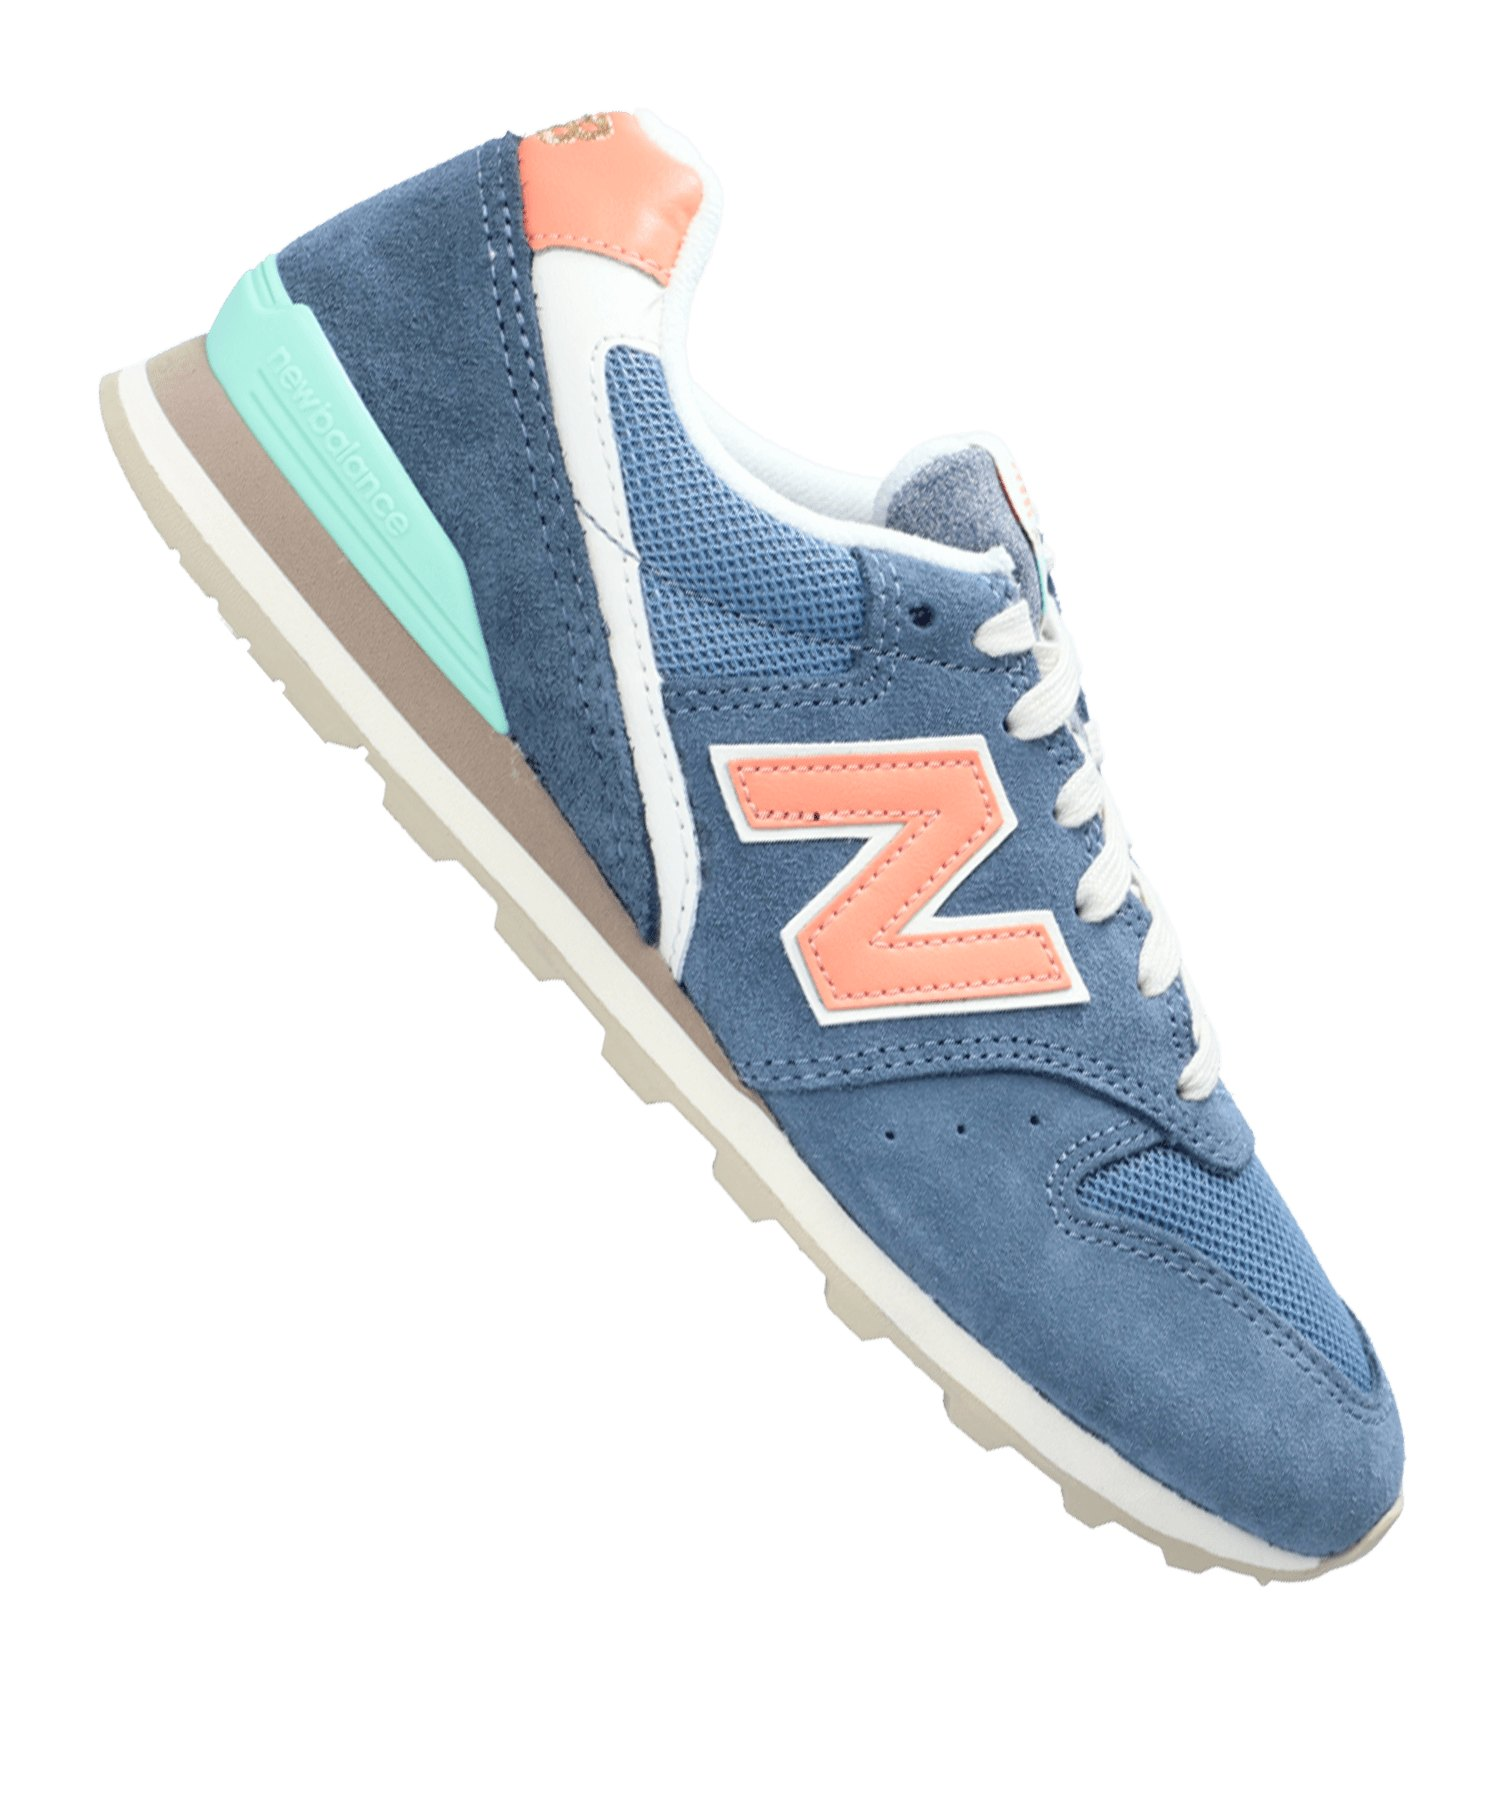 New Balance WL996 B Sneaker Damen Blau F5 - blau